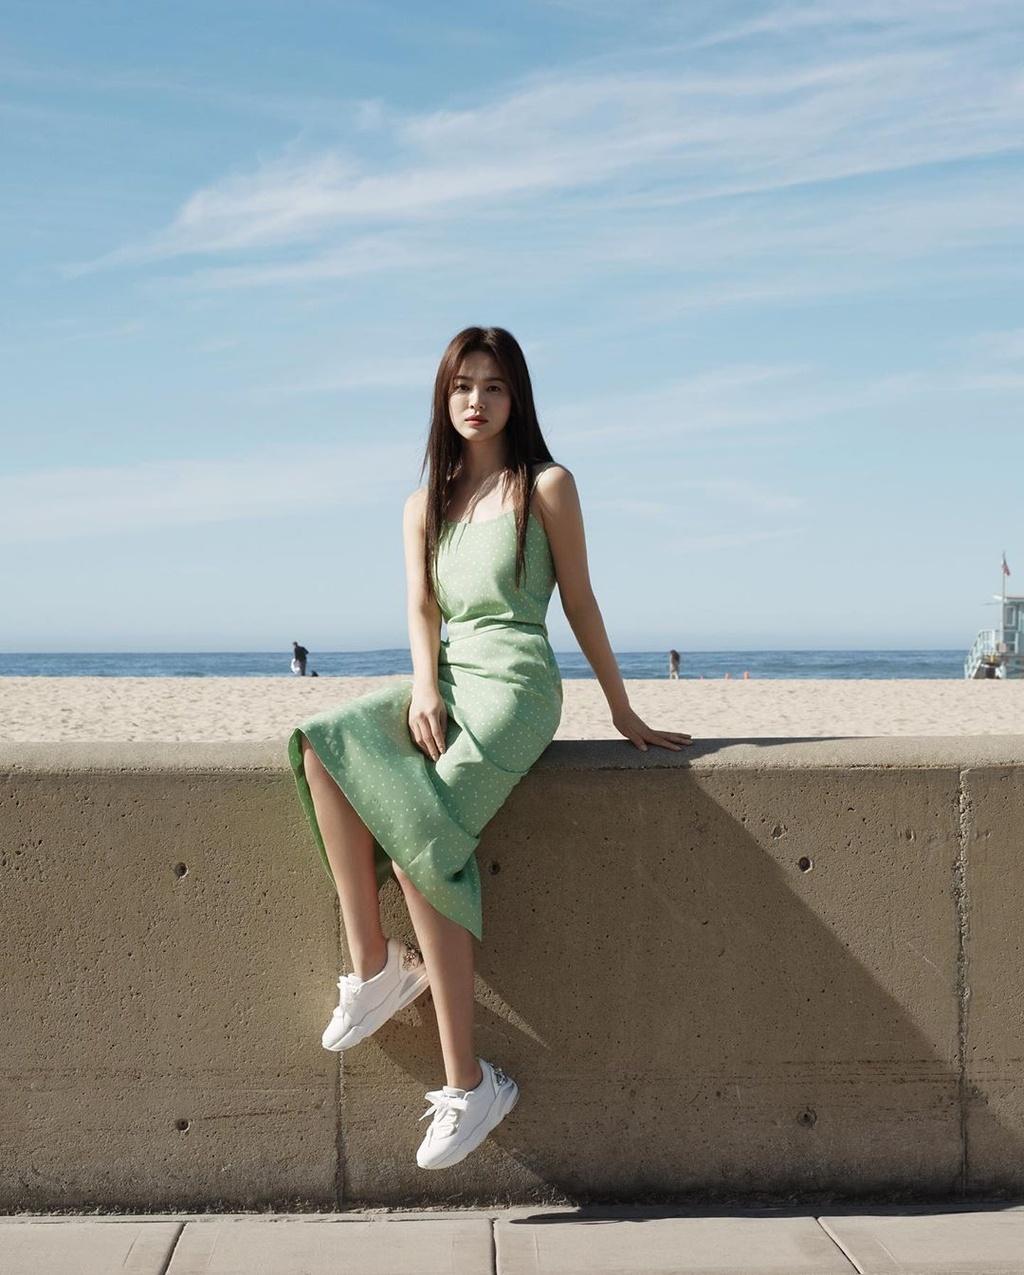 nhan sac song hye kyo sau ly hon anh 10